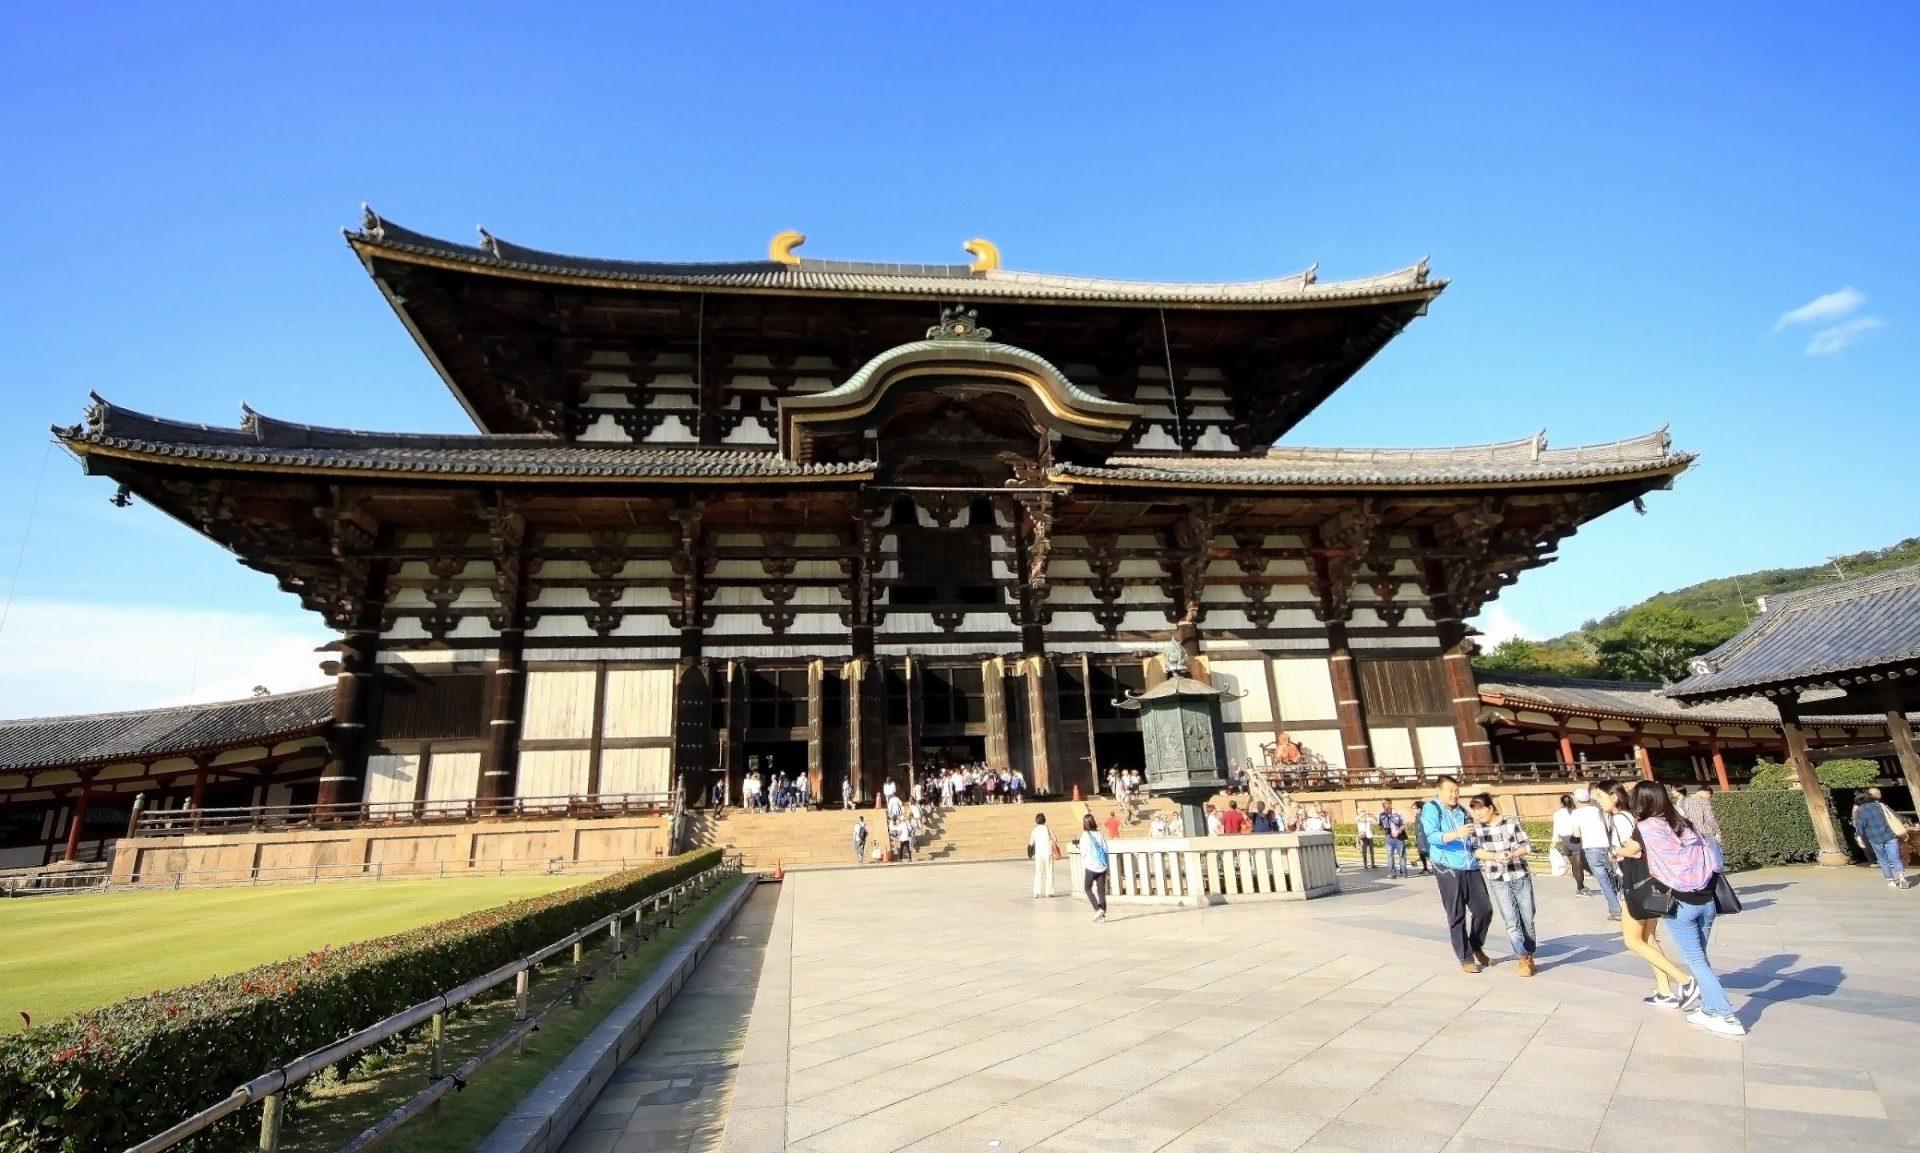 Dzień 4: Nara